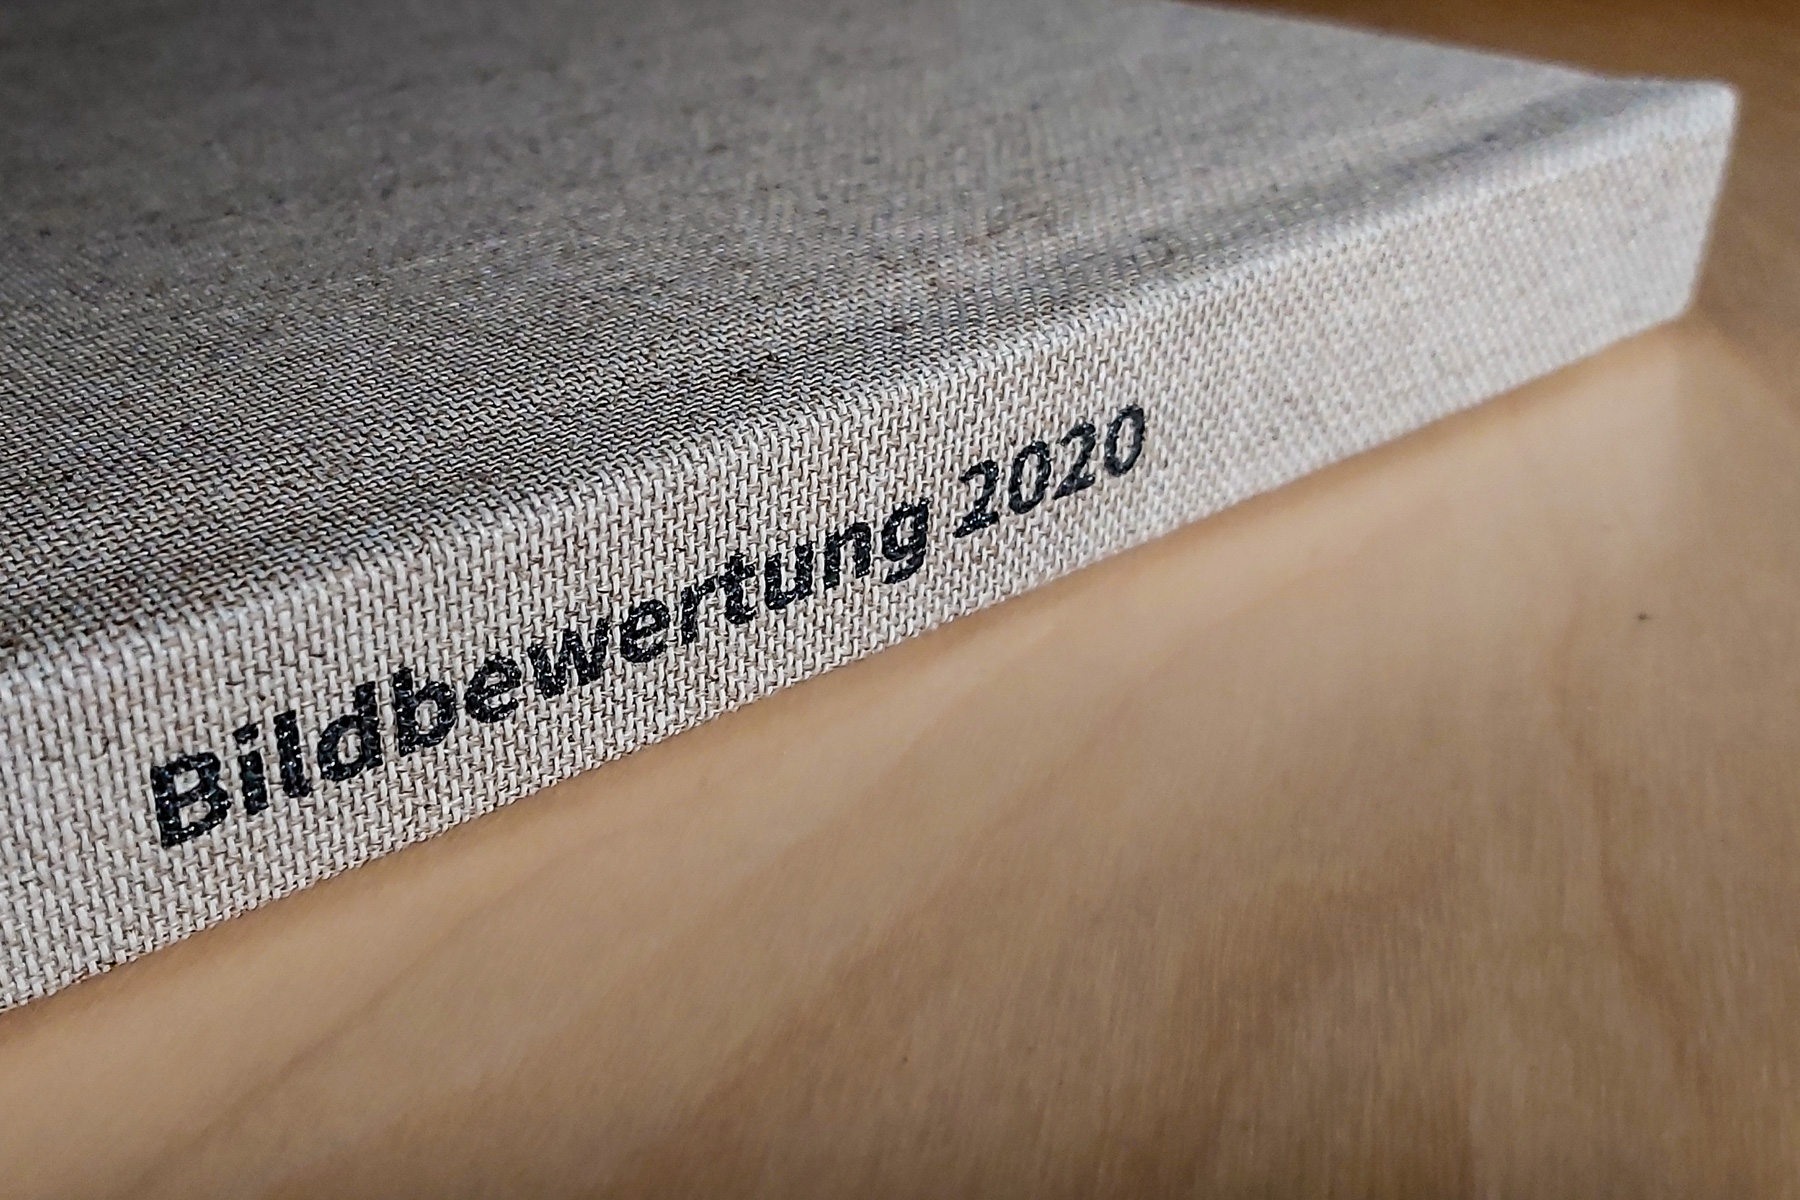 Fotobuch Bildbewertung 2020